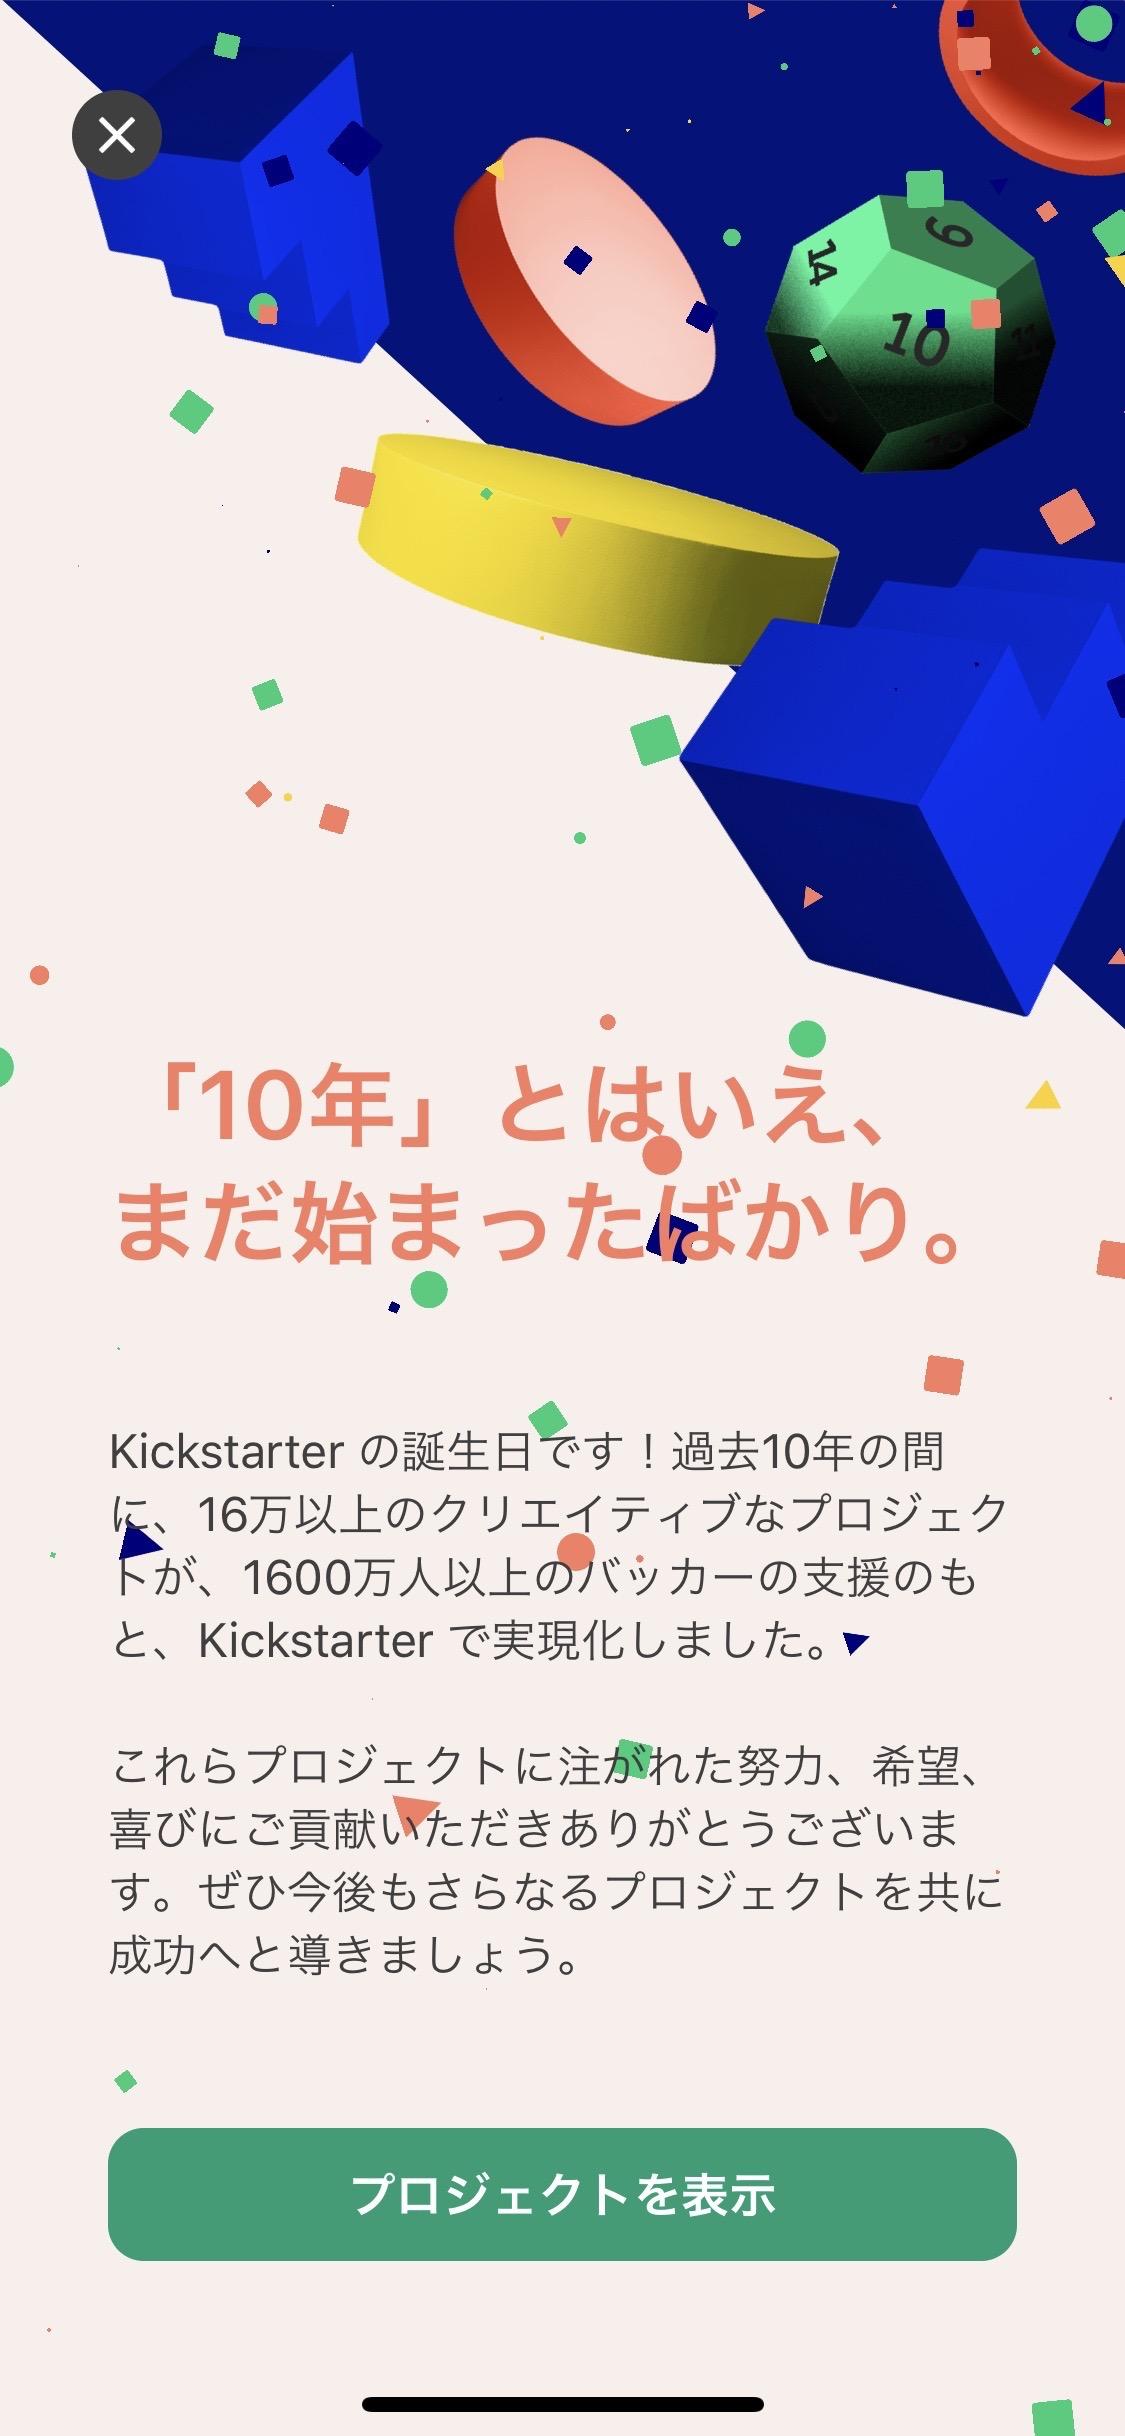 Kickstarter 10th Anniversary